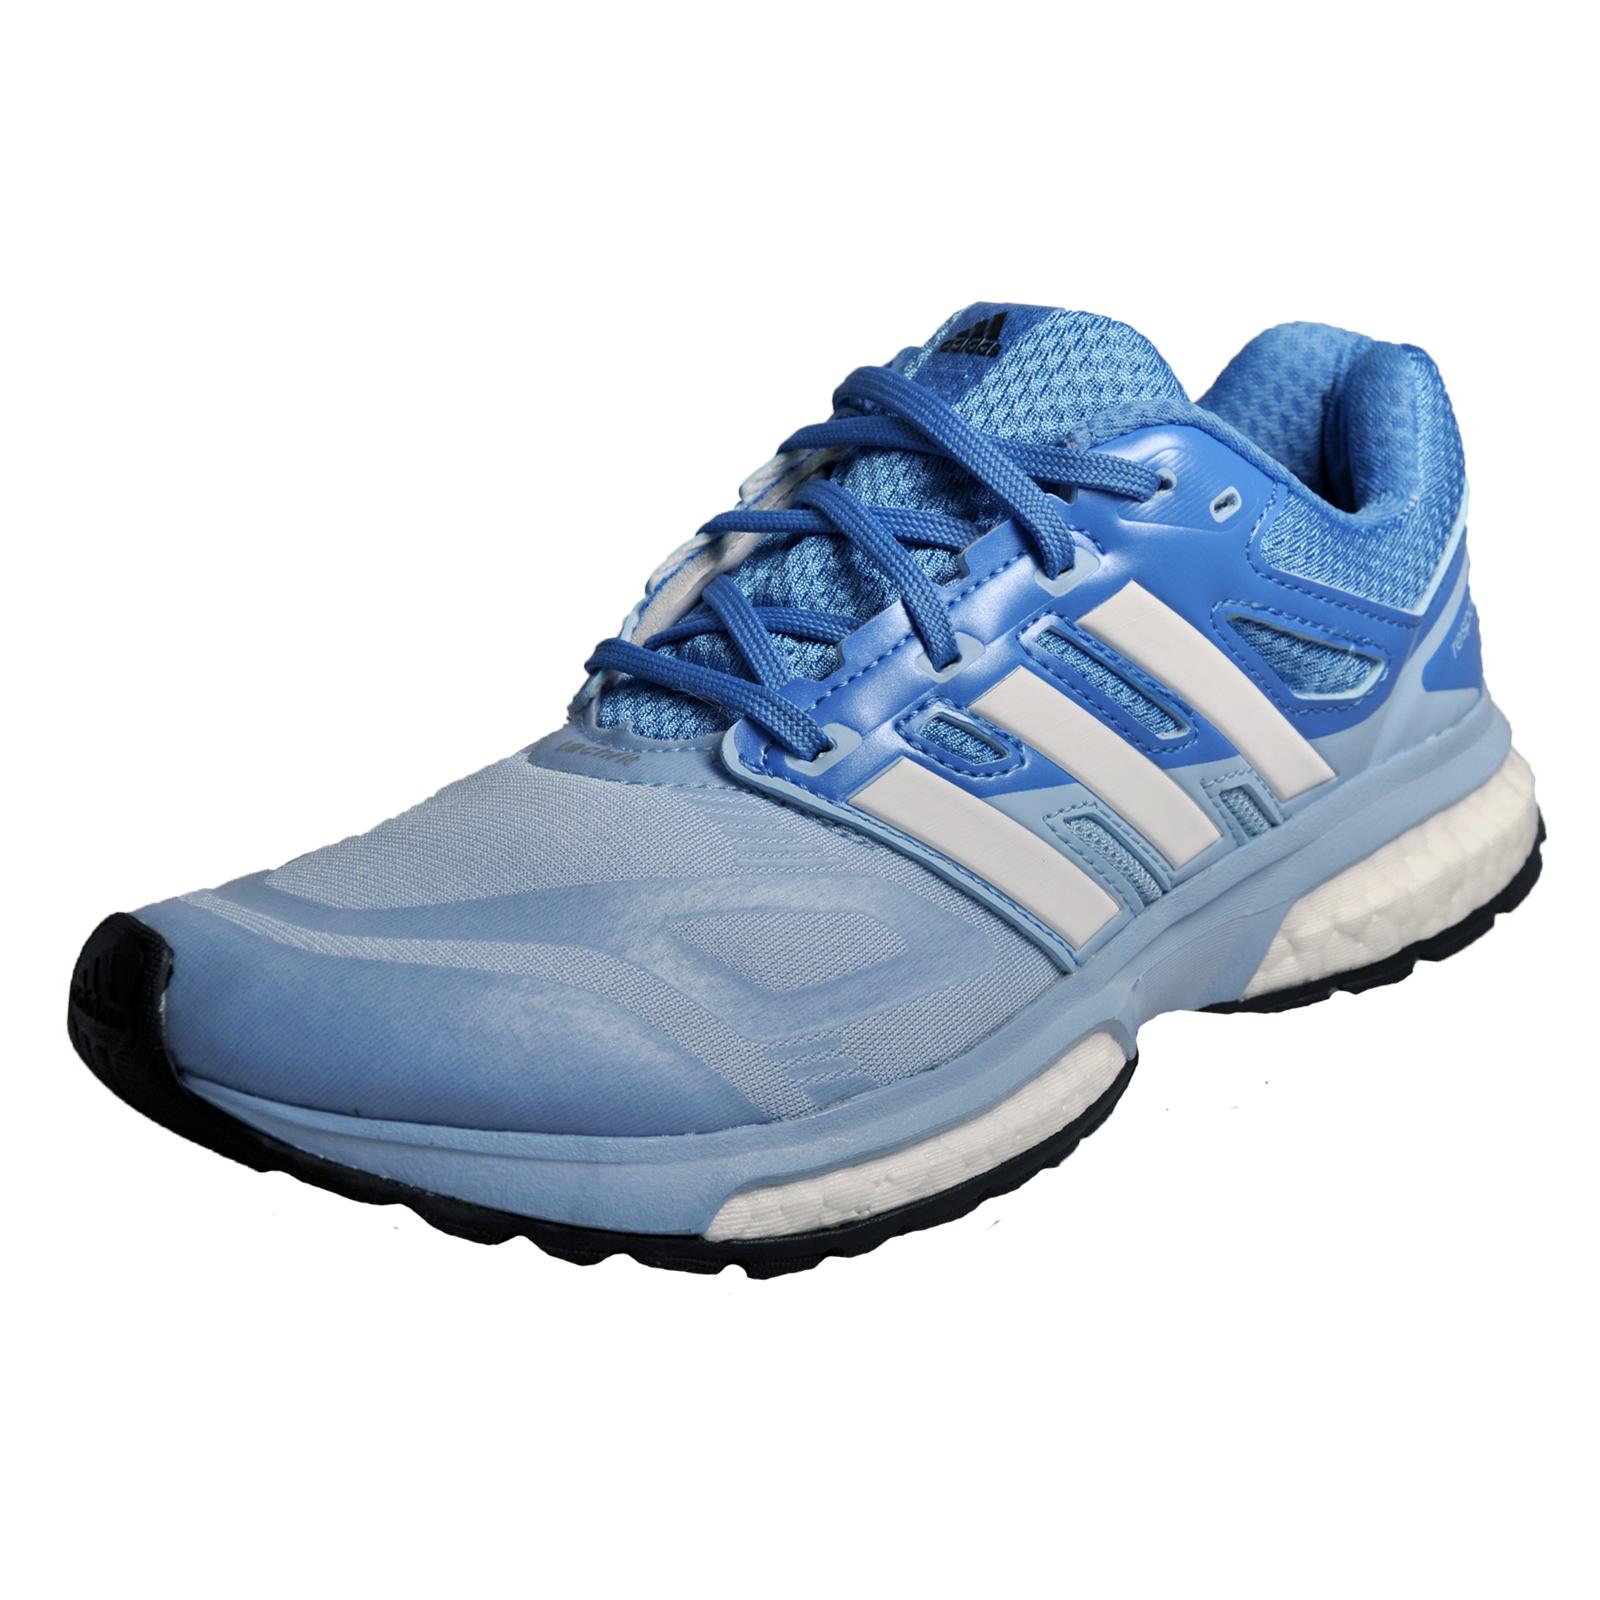 Adidas Response Boost Techfit Womens Running Shoes B Grade UK 6.5 Only